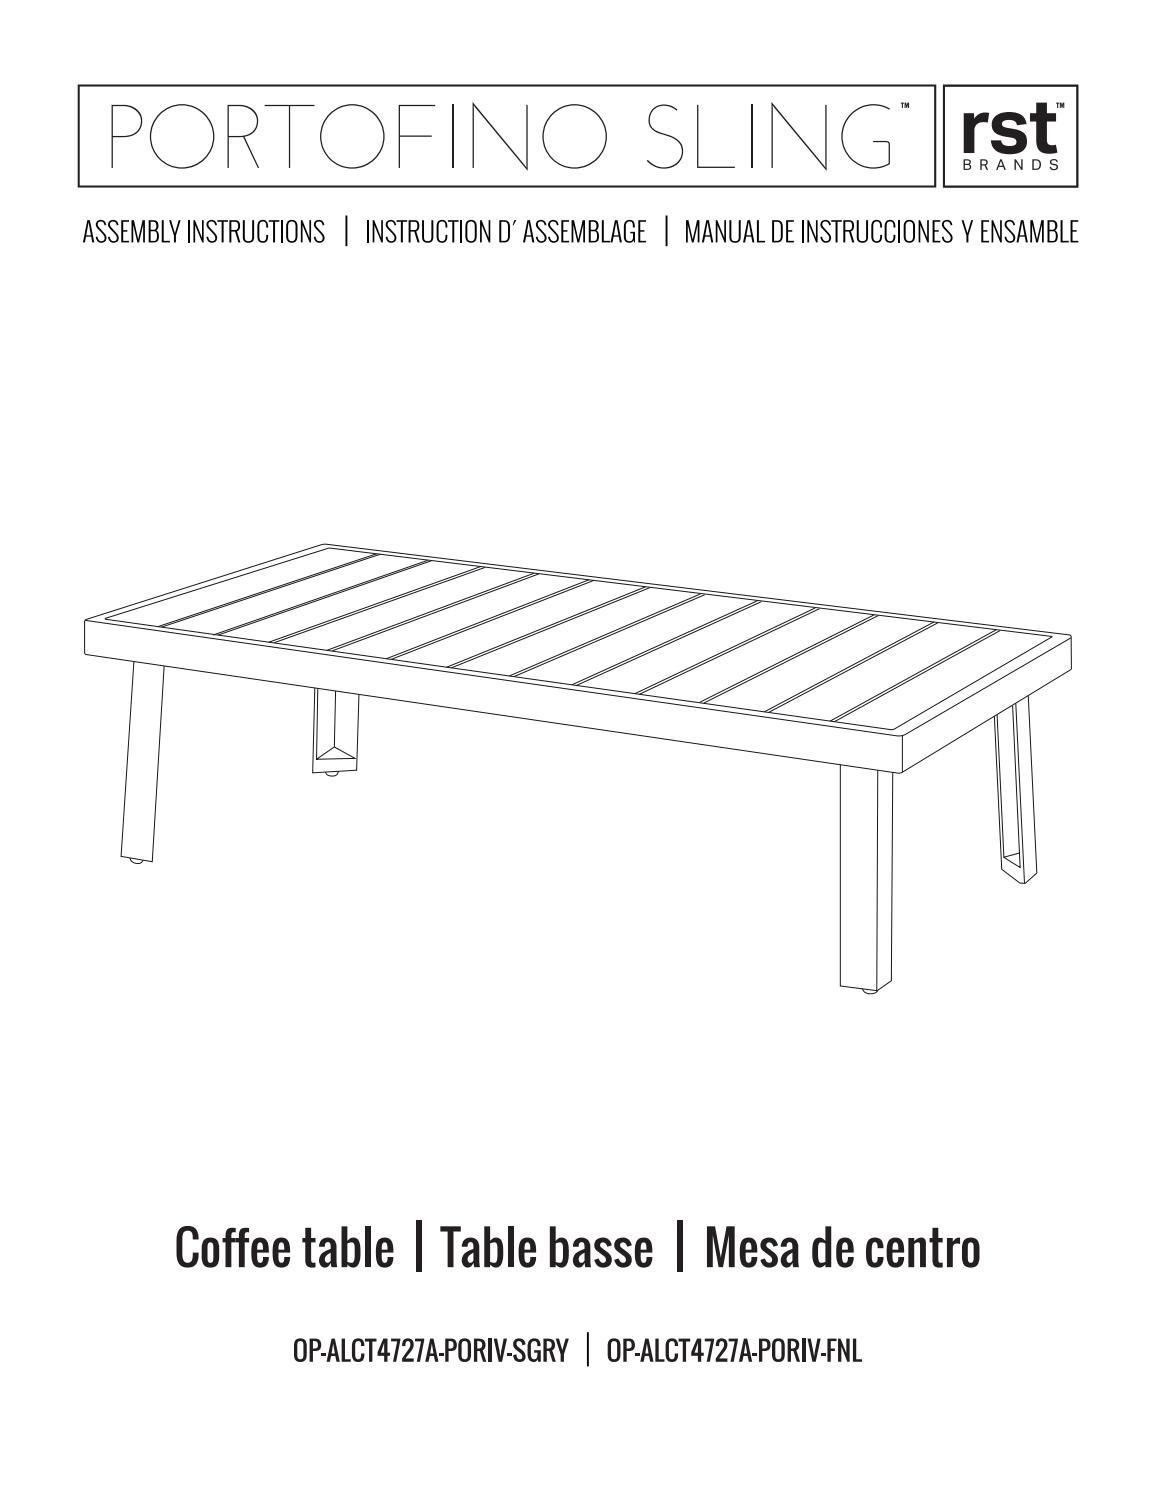 Peachy Portofino Sling Coffee Table Instructions For Grey And Creativecarmelina Interior Chair Design Creativecarmelinacom